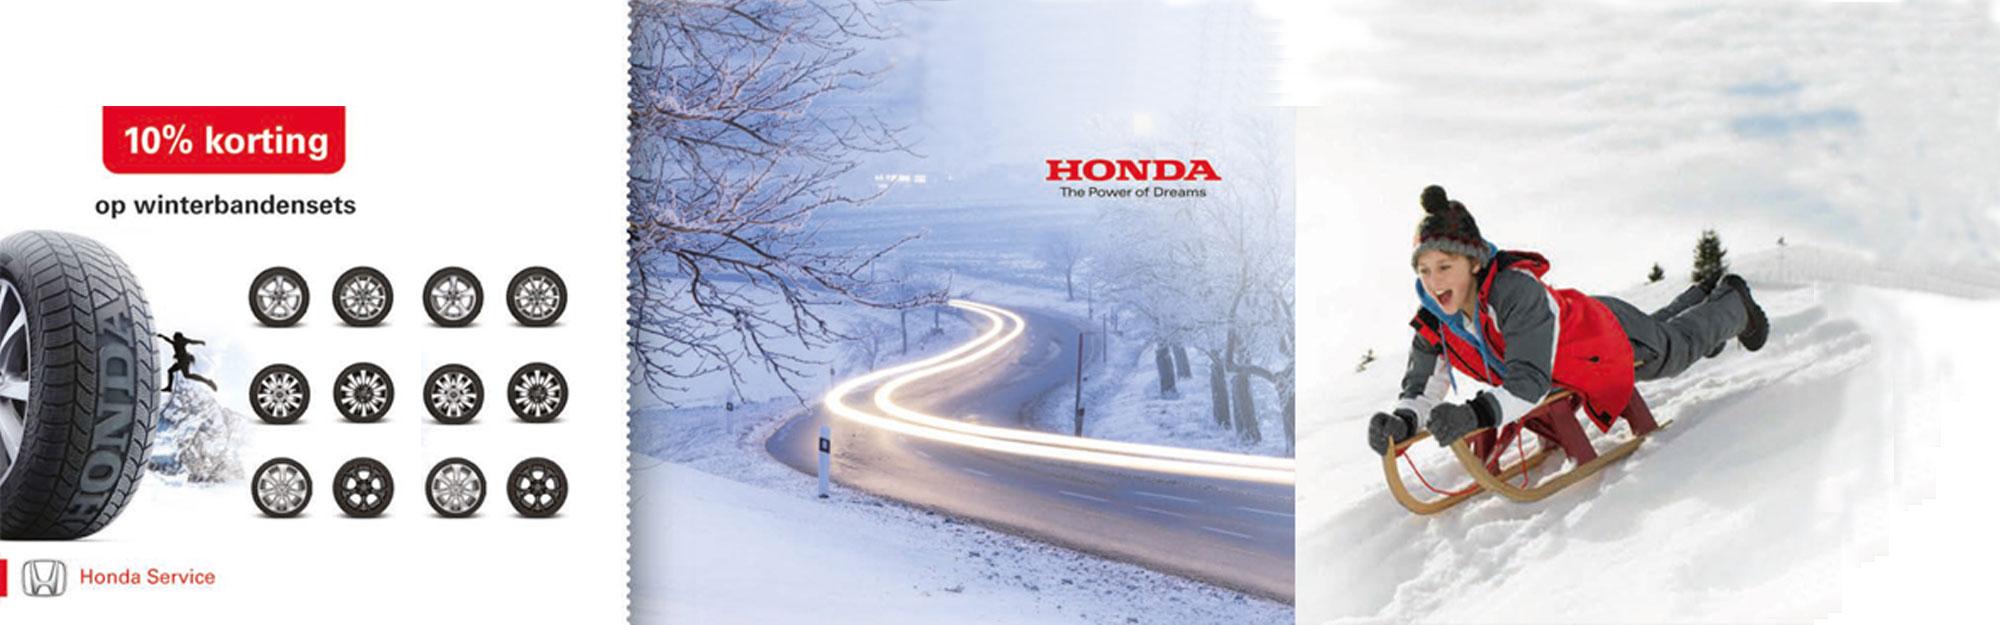 GARAGE-Vabis-Honda-Winterbandenset-korting-2000x625